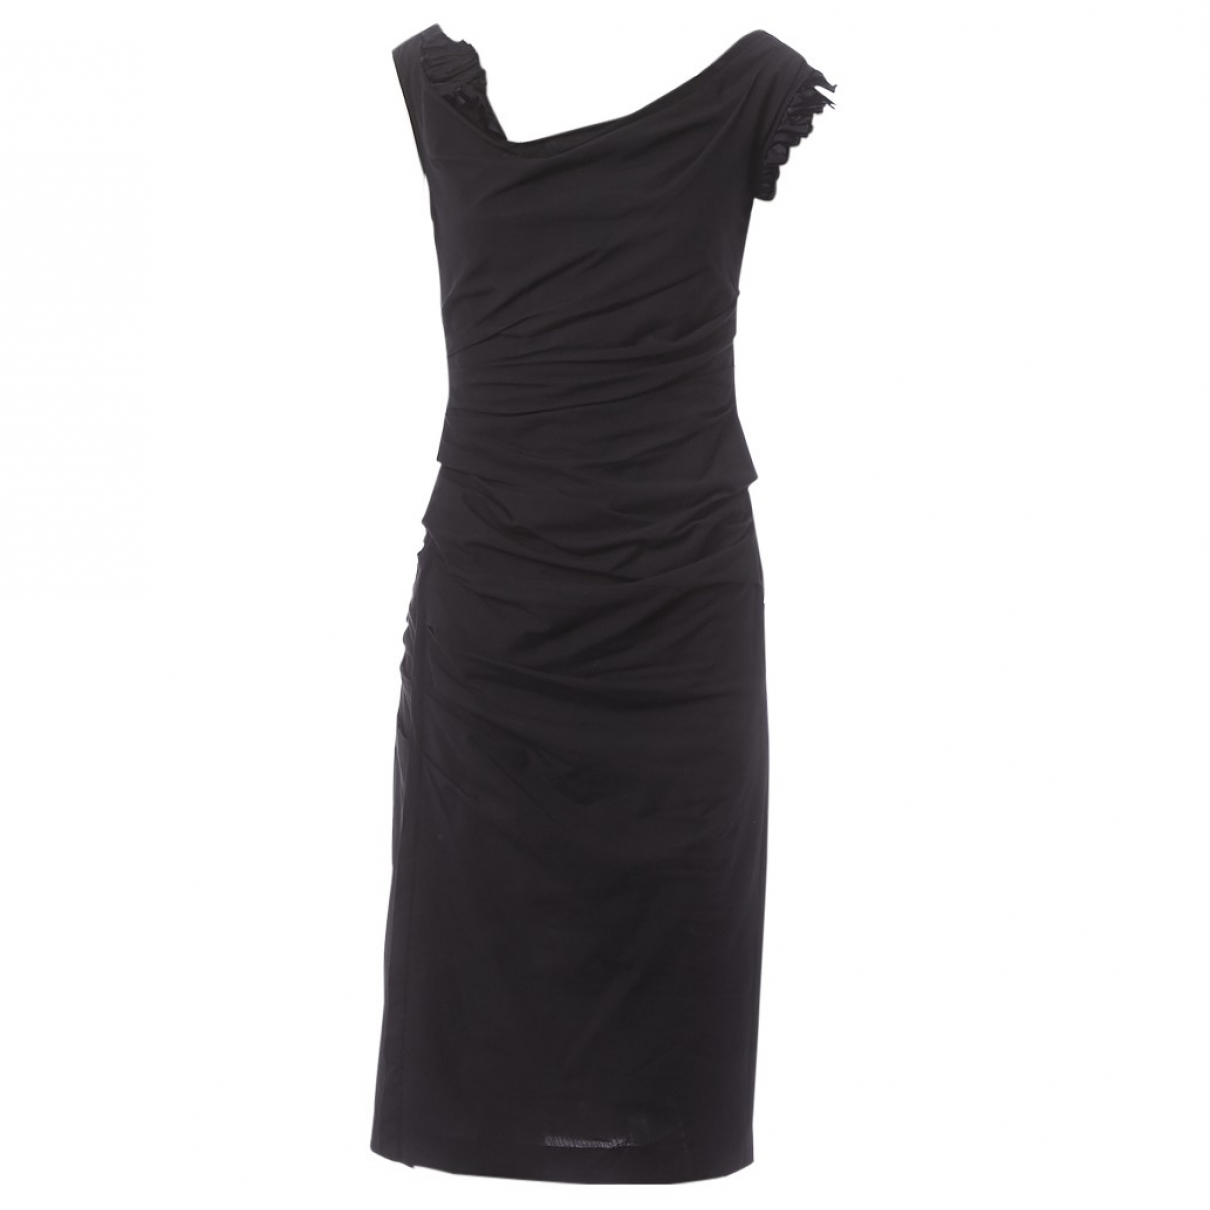 Vera Wang \N Black Cotton - elasthane dress for Women 38 FR